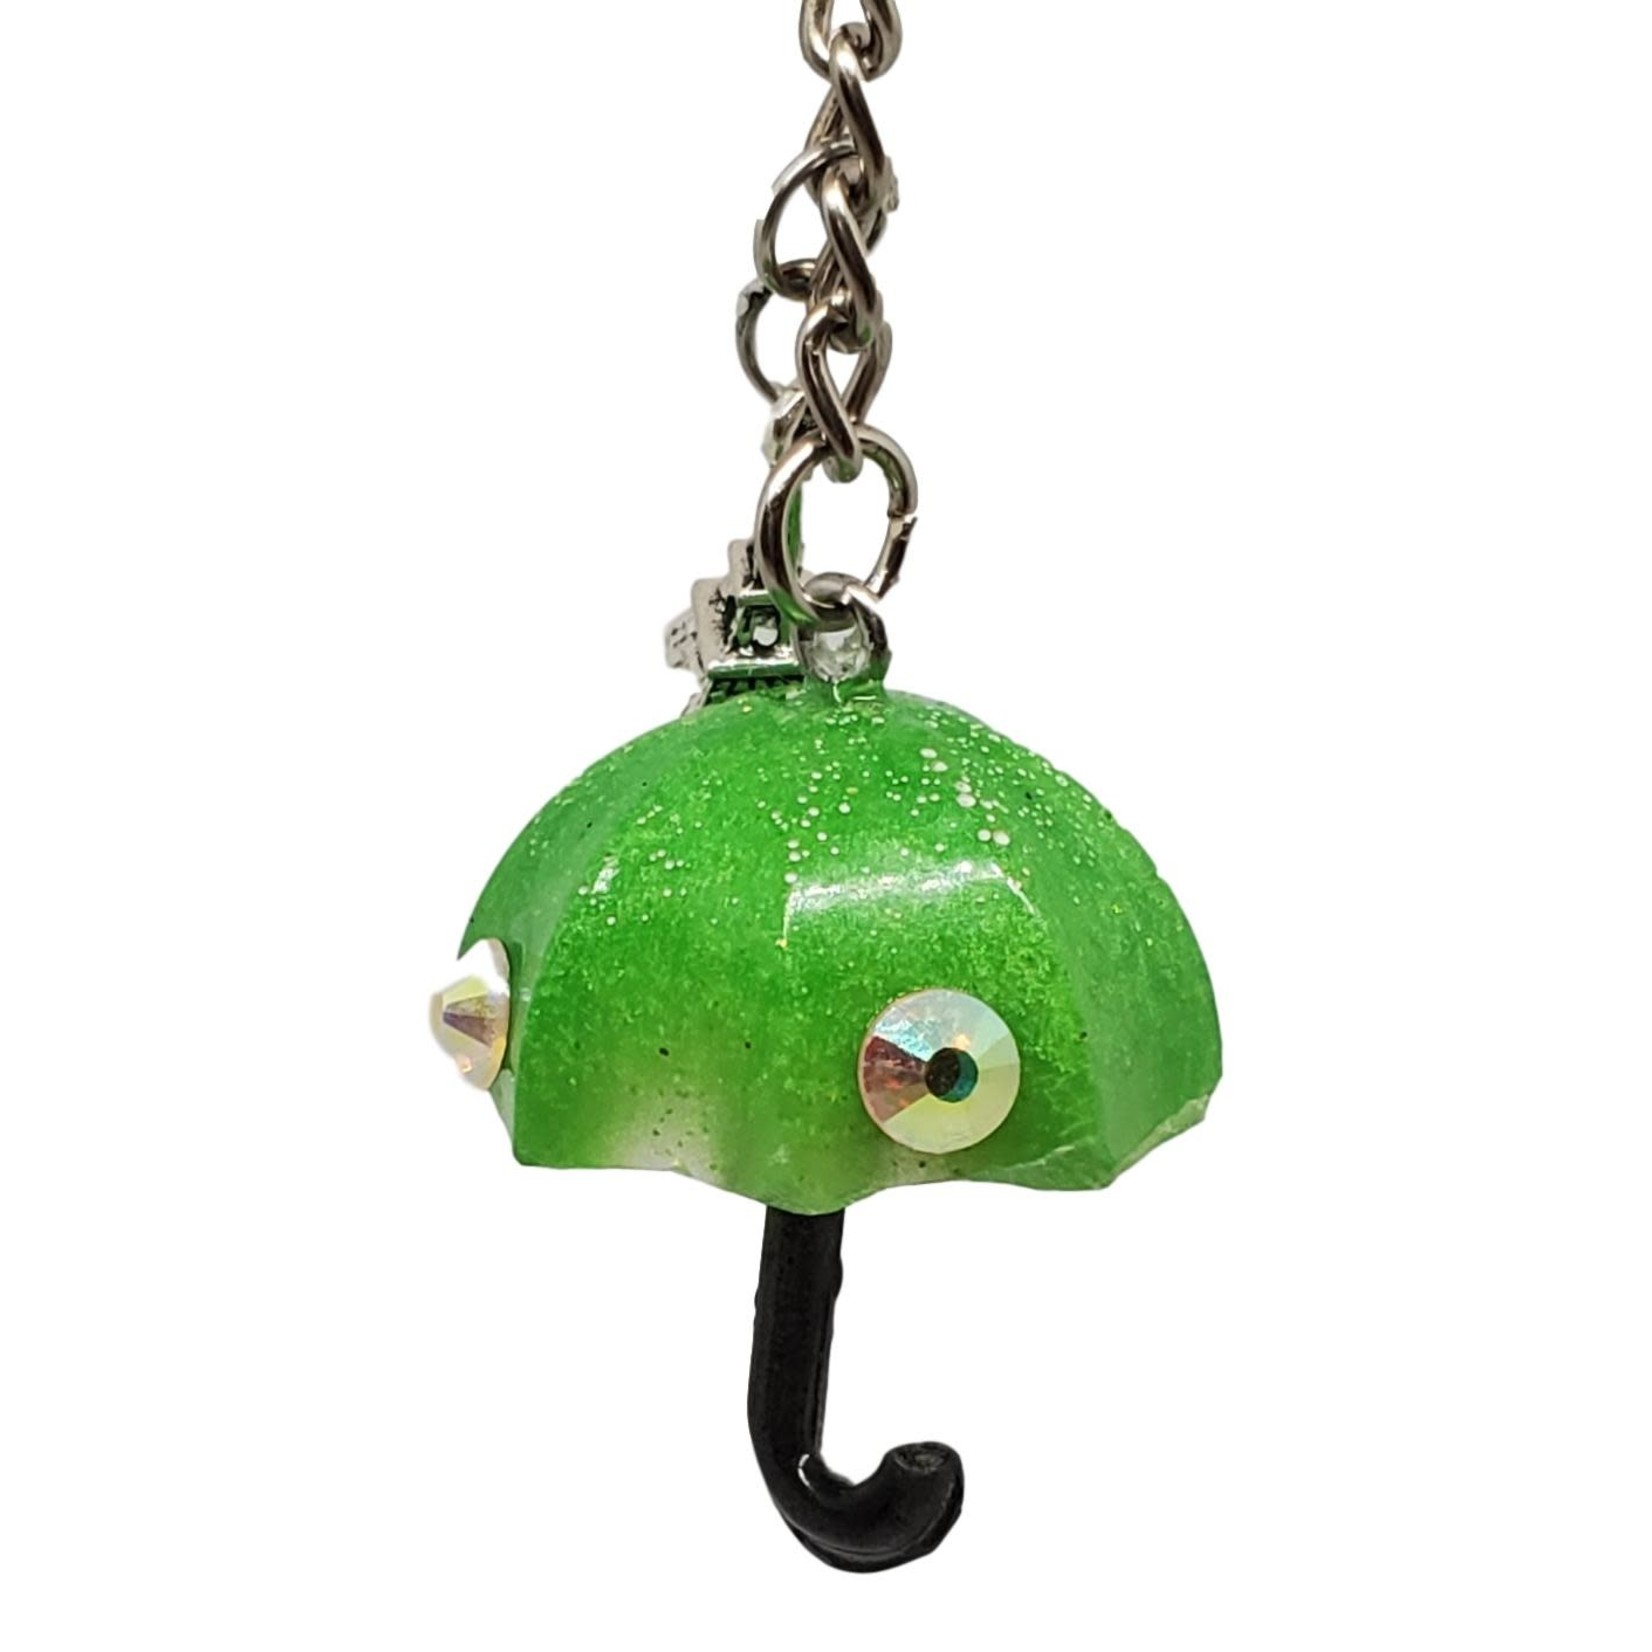 East Coast Sirens Umbrella Key Chain